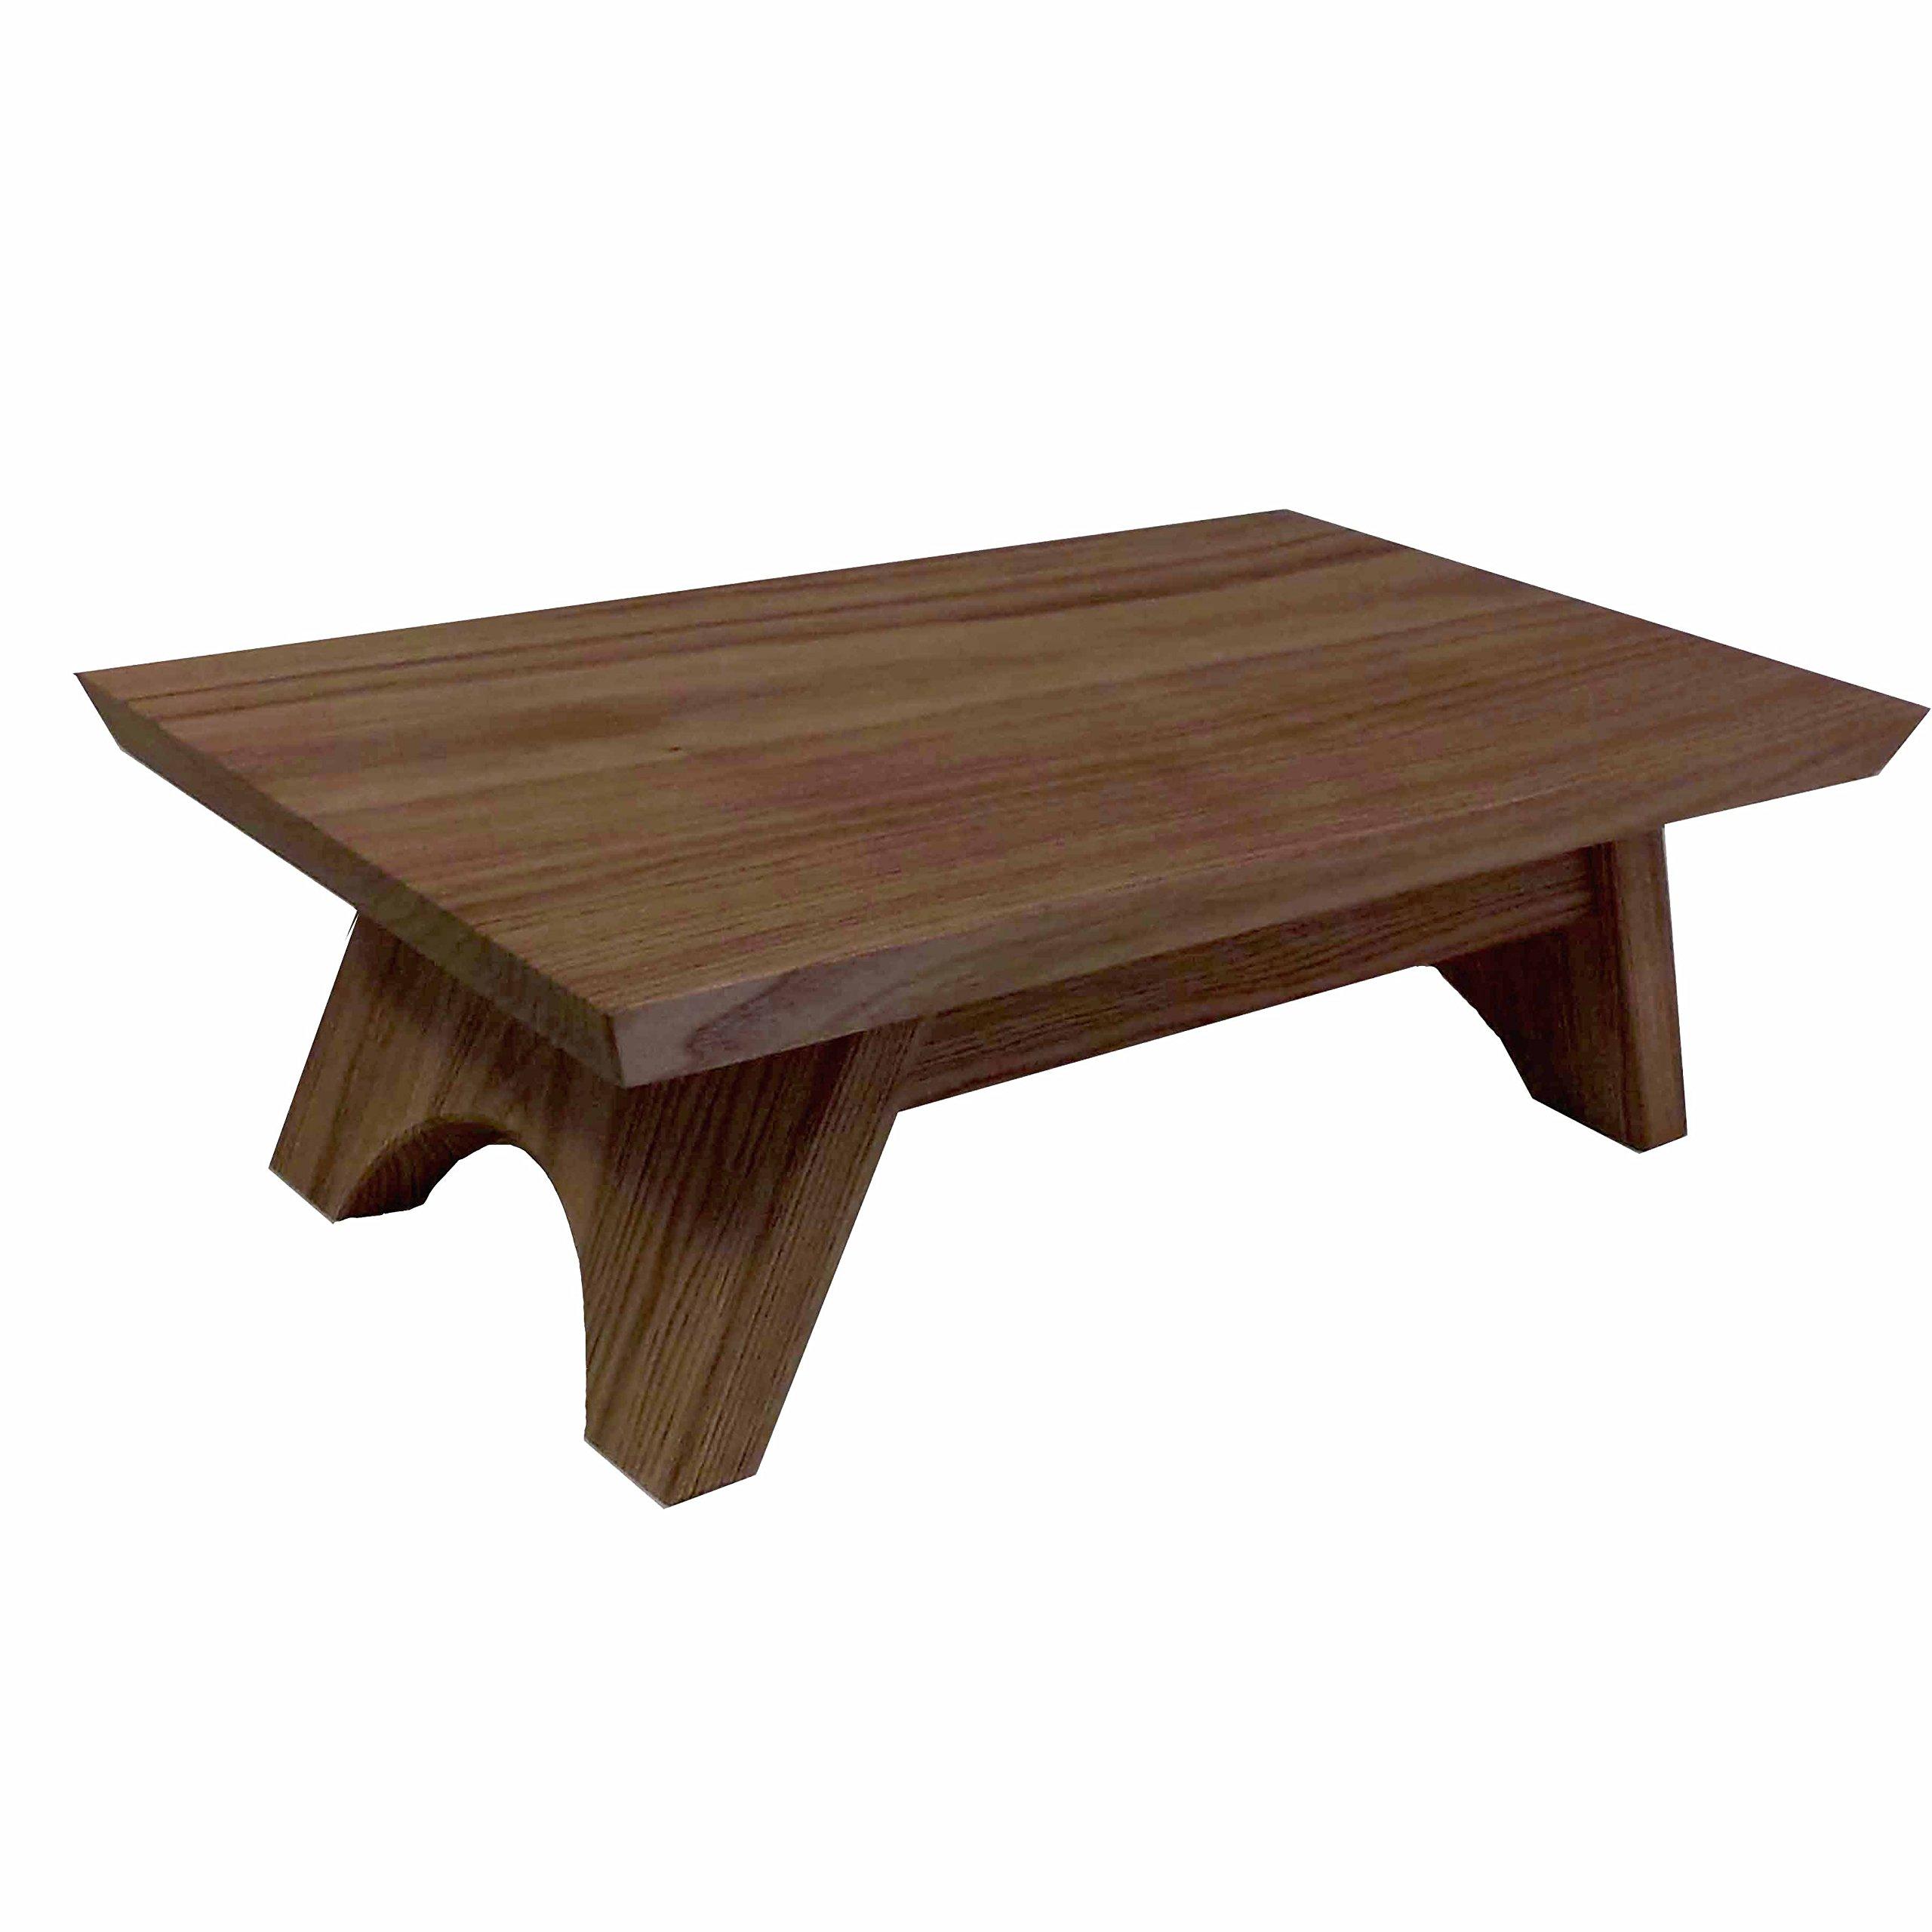 EarthBench Pedestal Stand ~ BUTTERNUT (Shrine Table Pedestal: 15''×9'' wide)